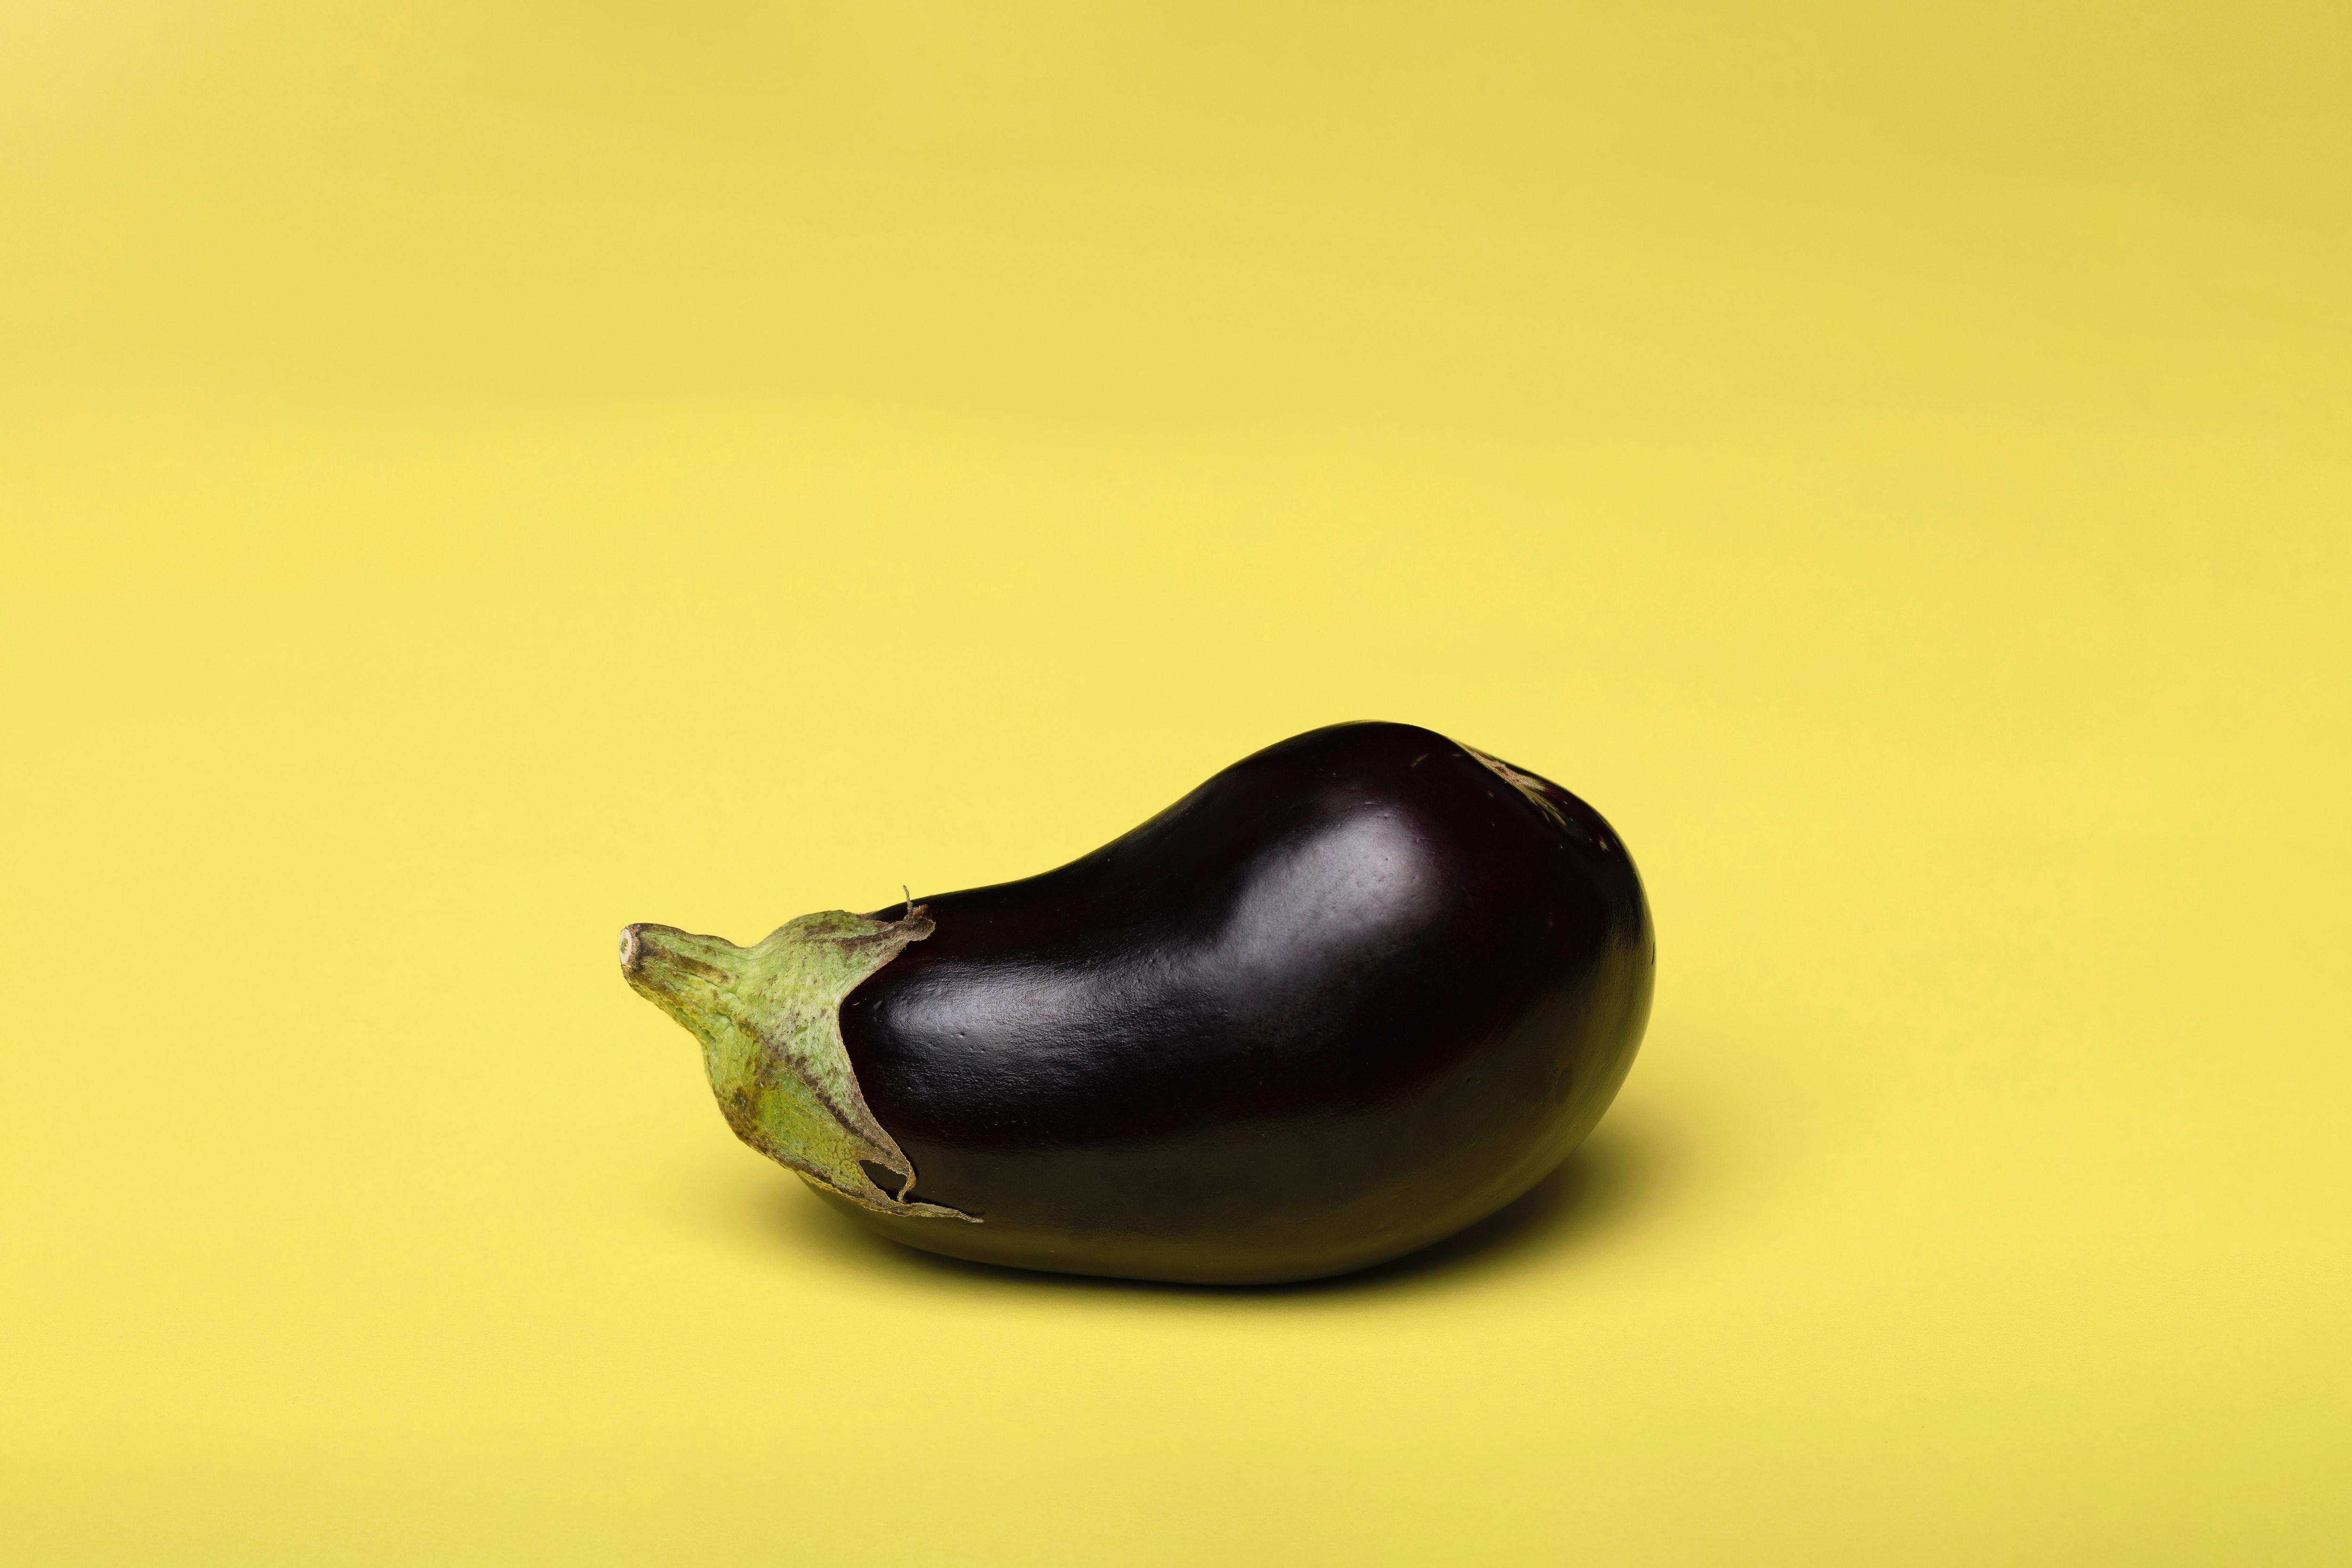 Nar ekşili vegan patlıcan